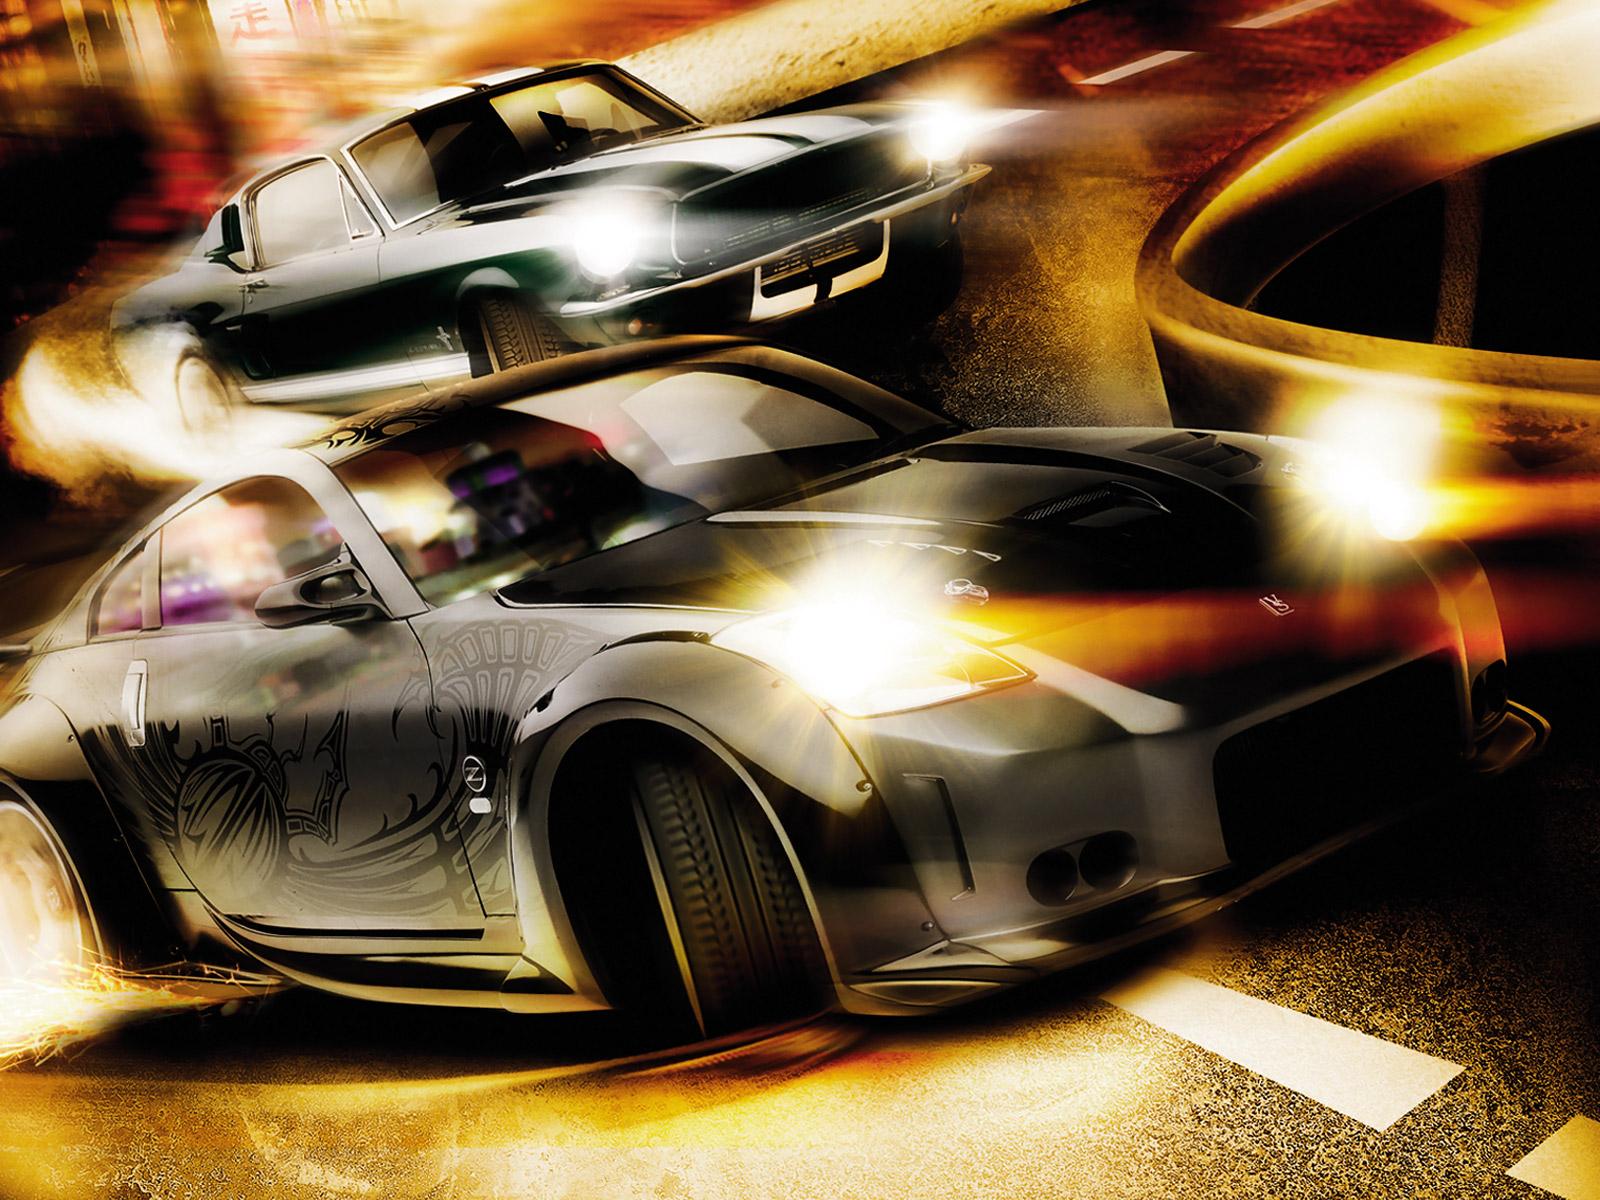 Amazing car photos fast furious 1 1600x1200